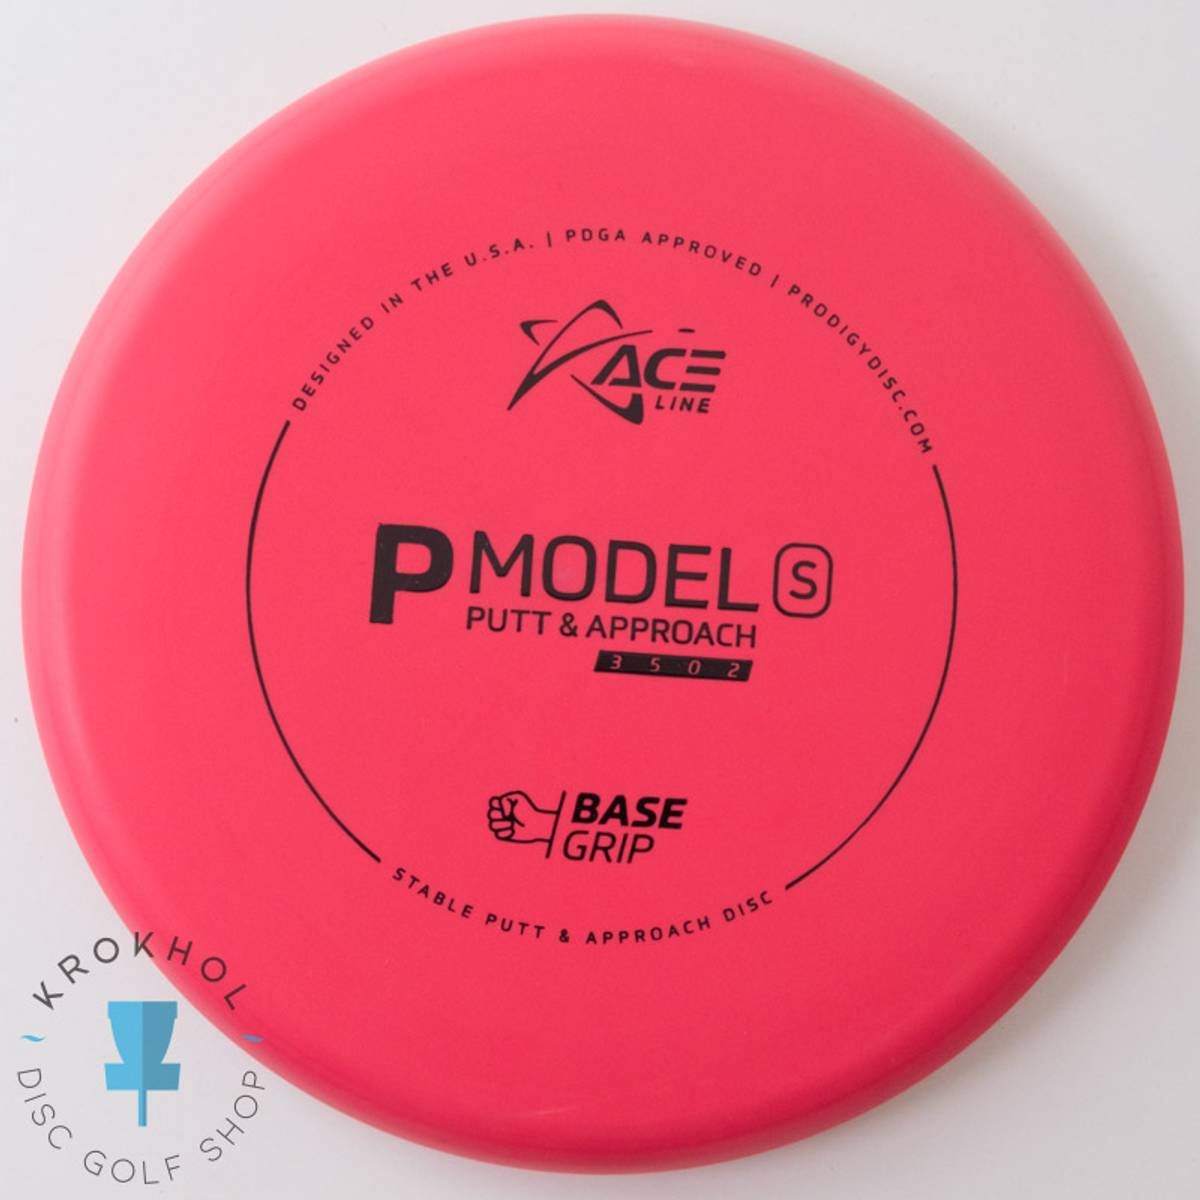 BaseGrip P Model S